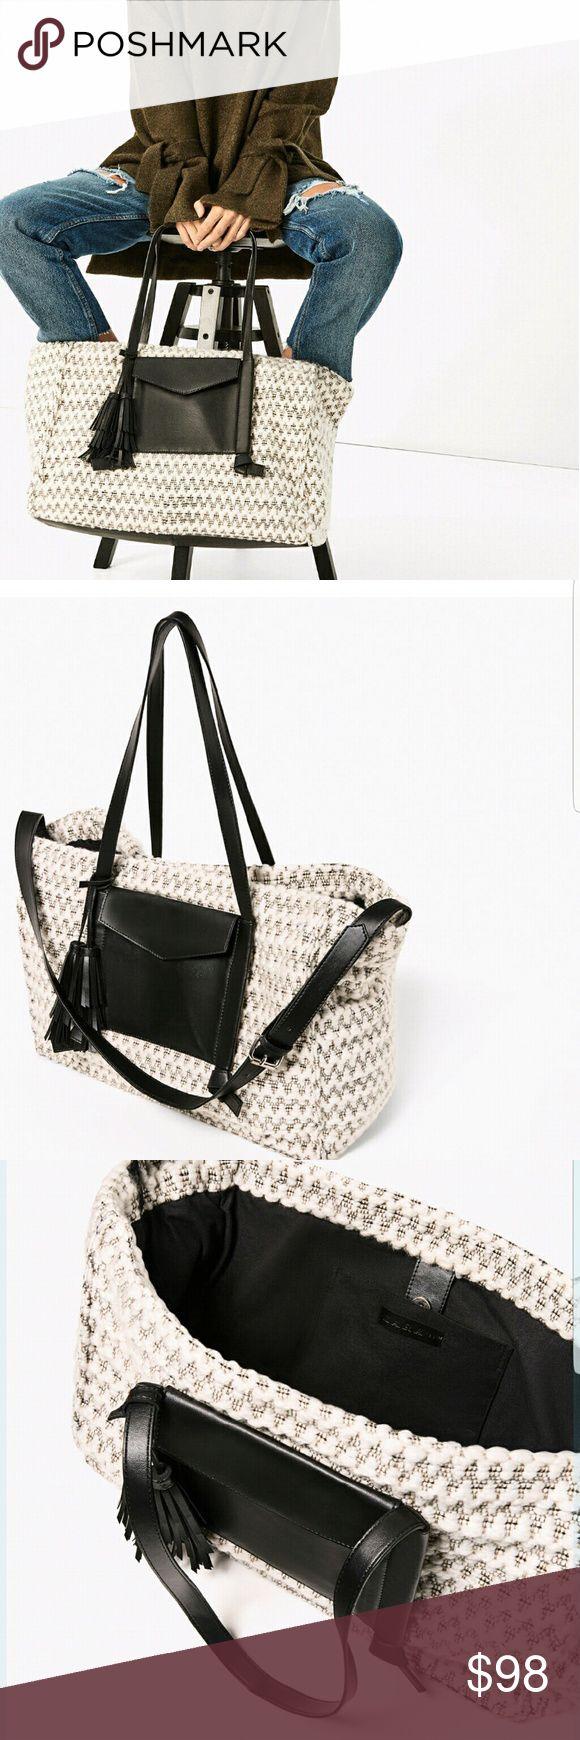 ZARA LARGE FABRIC TOTE BAG BRAND NEW ZARA TOTE BAG BRAND NEW. 12.9 x 17.3 x 7.8 Zara Bags Totes